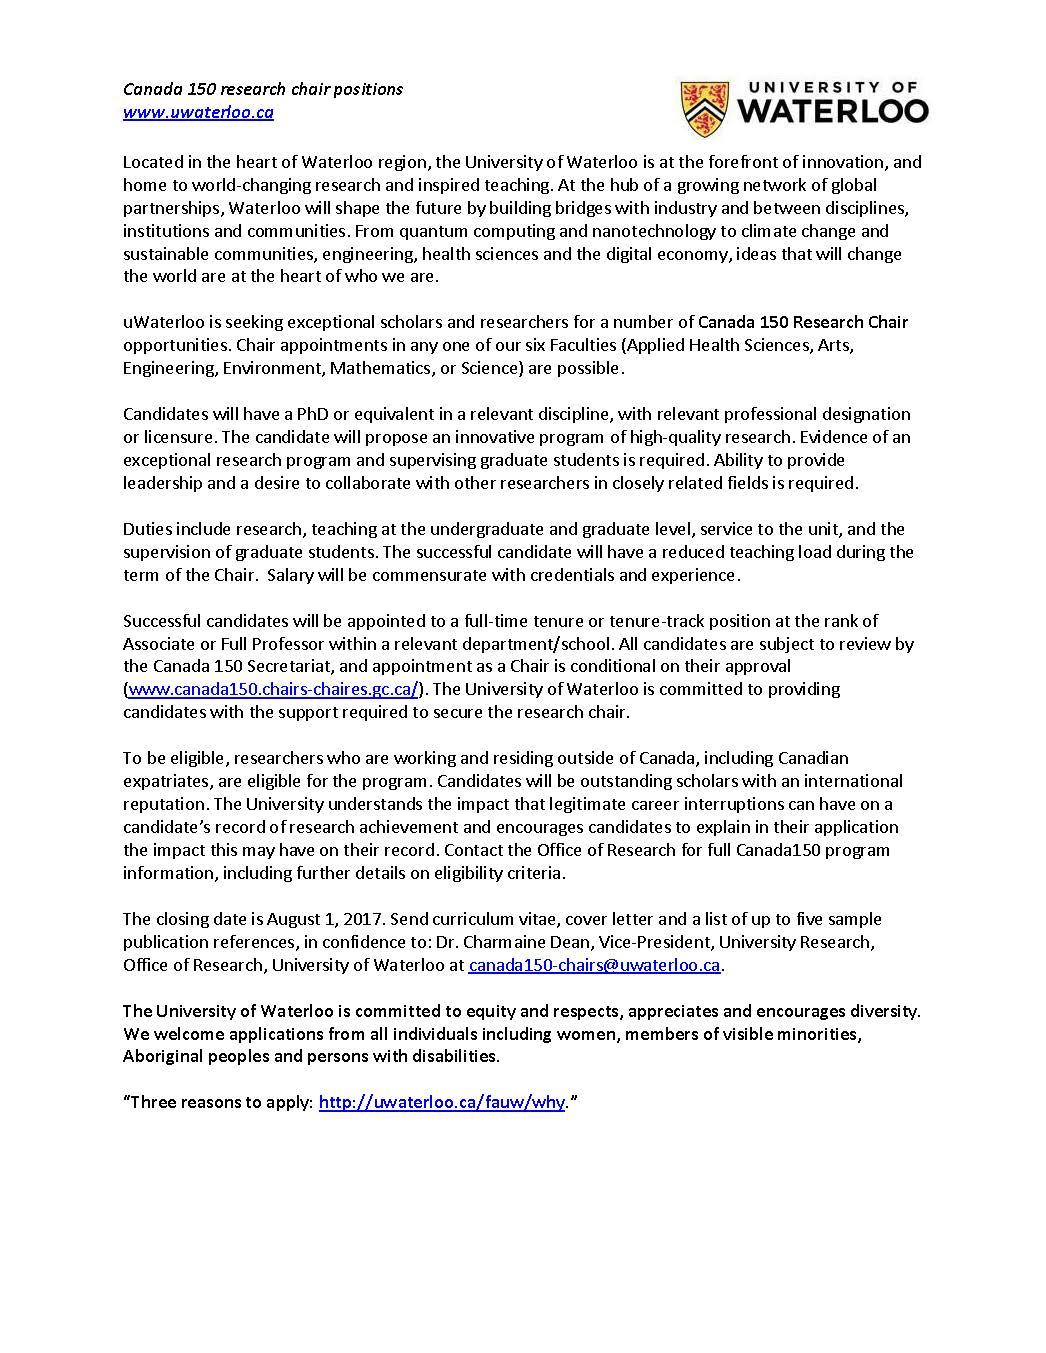 WebPosting-Canada150-06-Jul-2017